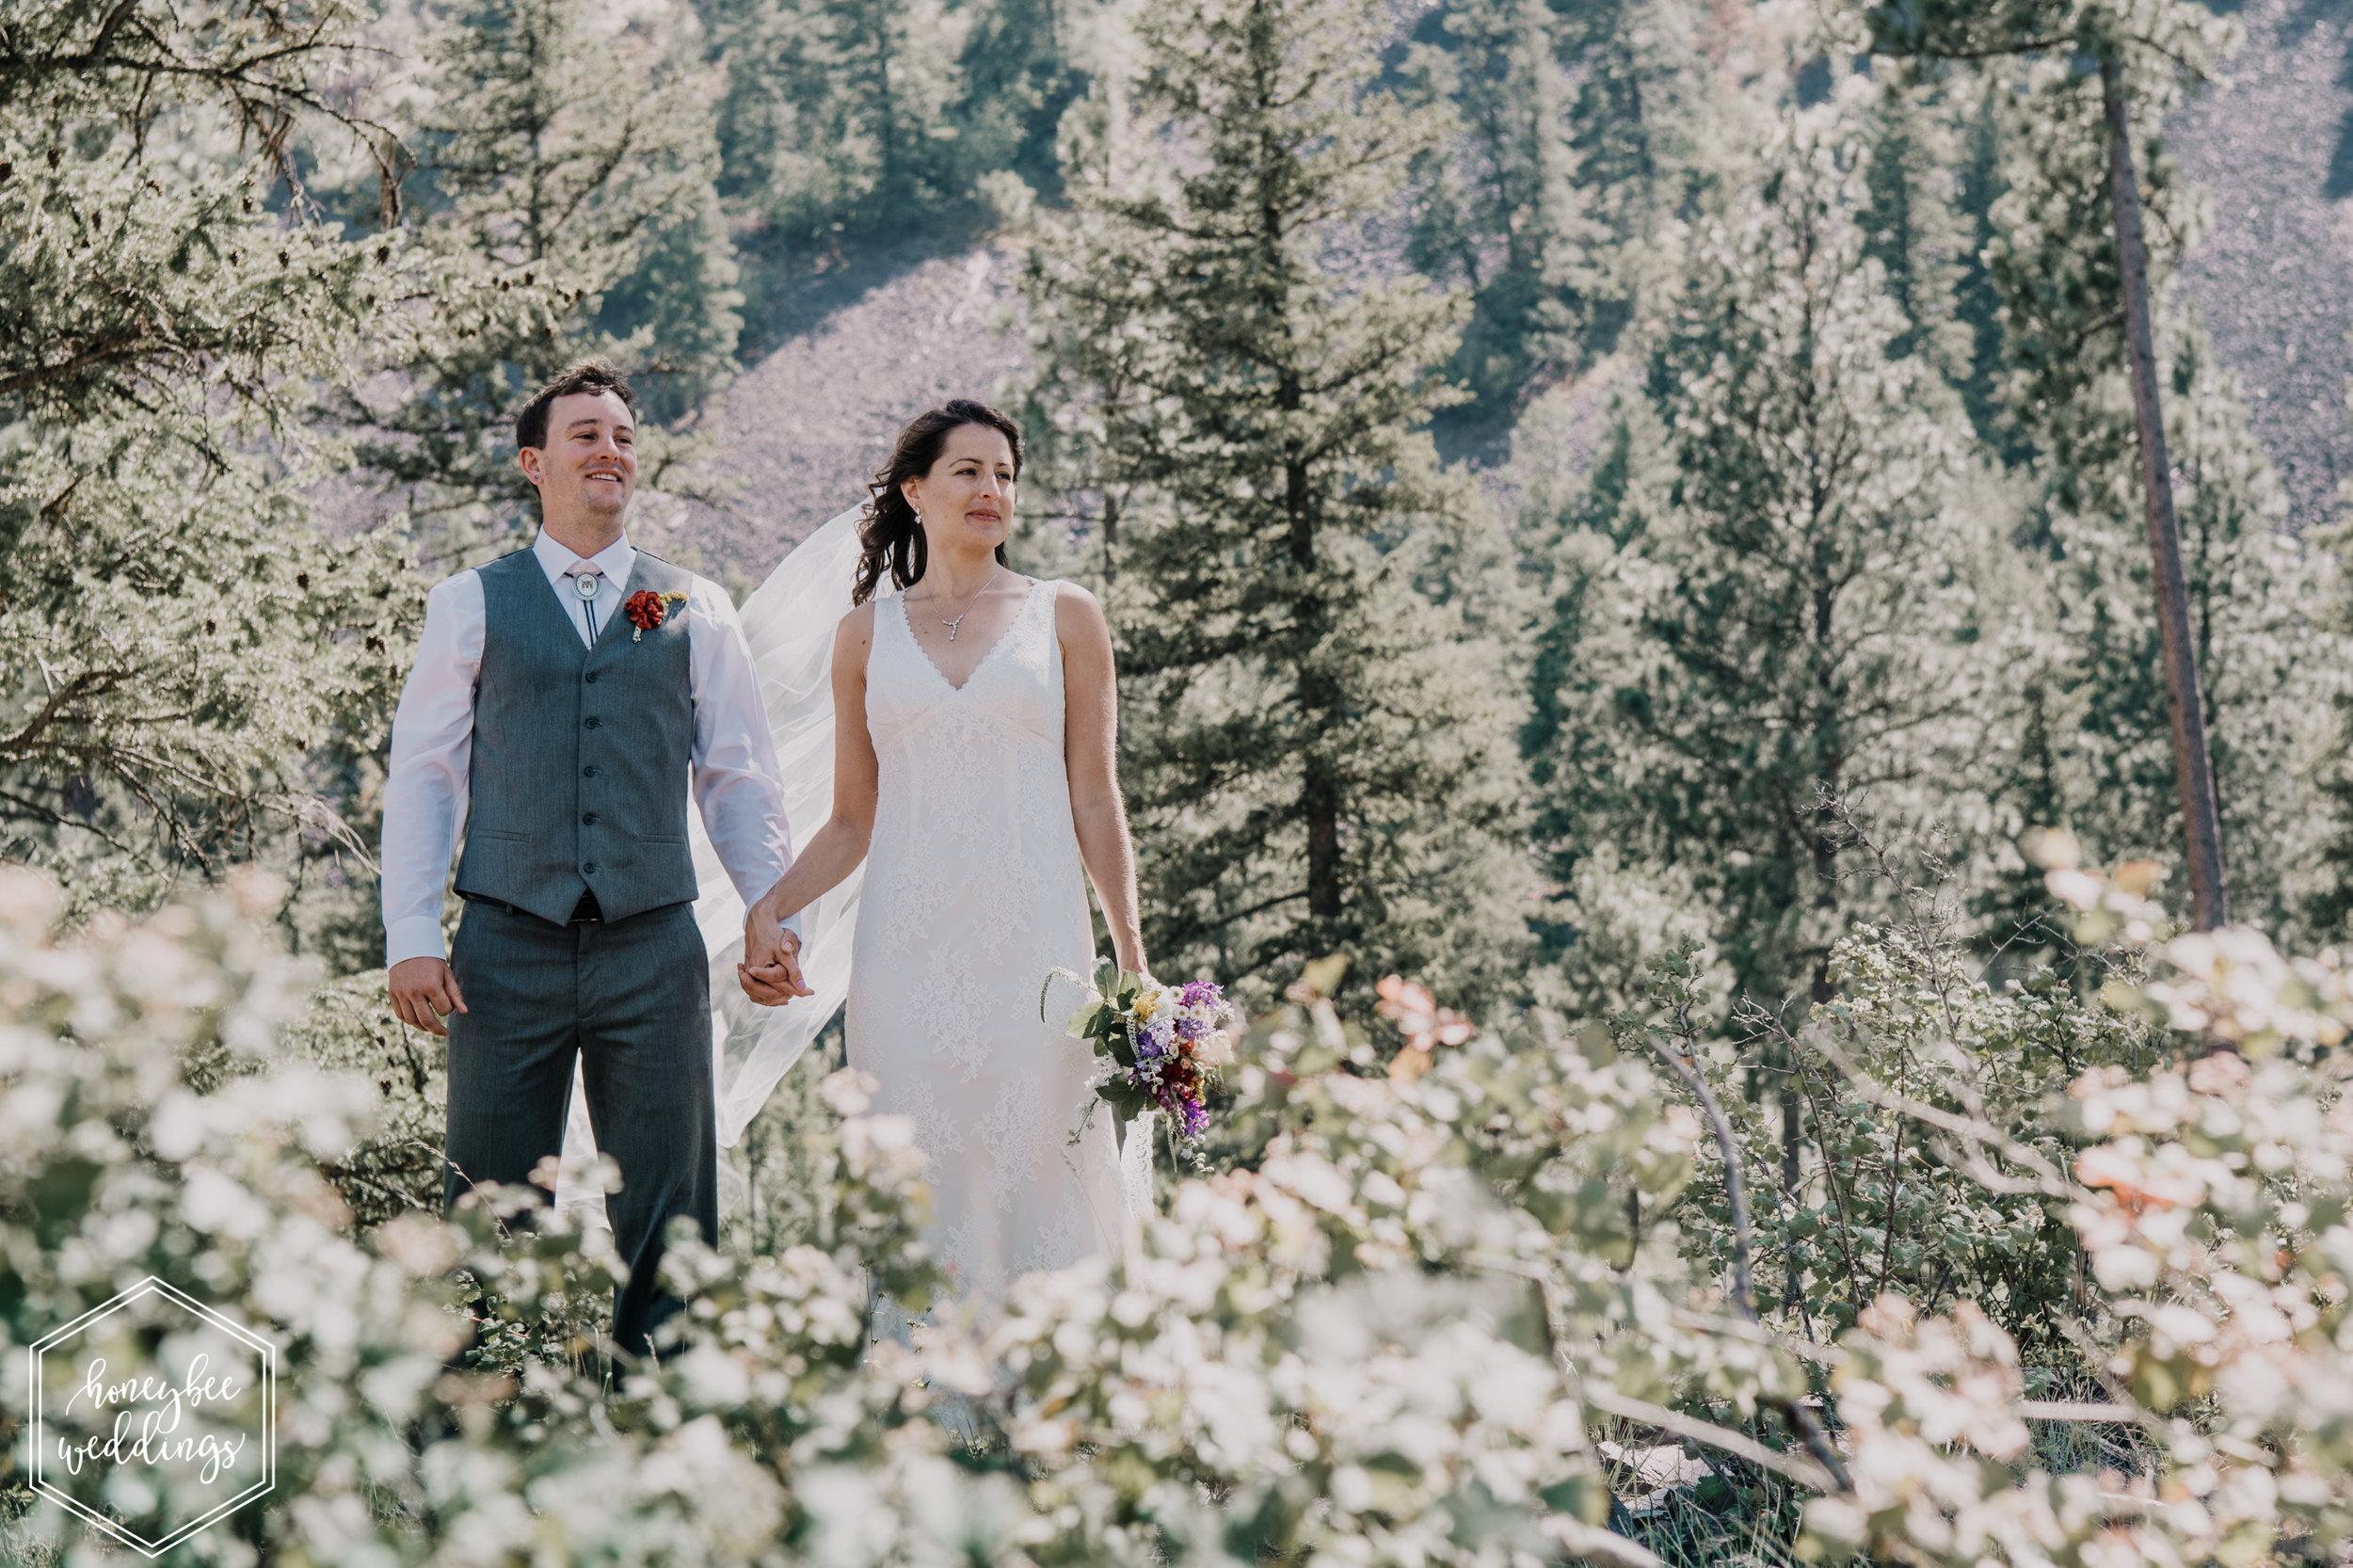 180 White Raven Wedding_Montana Wedding Photographer_Honeybee Weddings_ Meghan Maloney + Arza Hammond 2018-9295-2.jpg